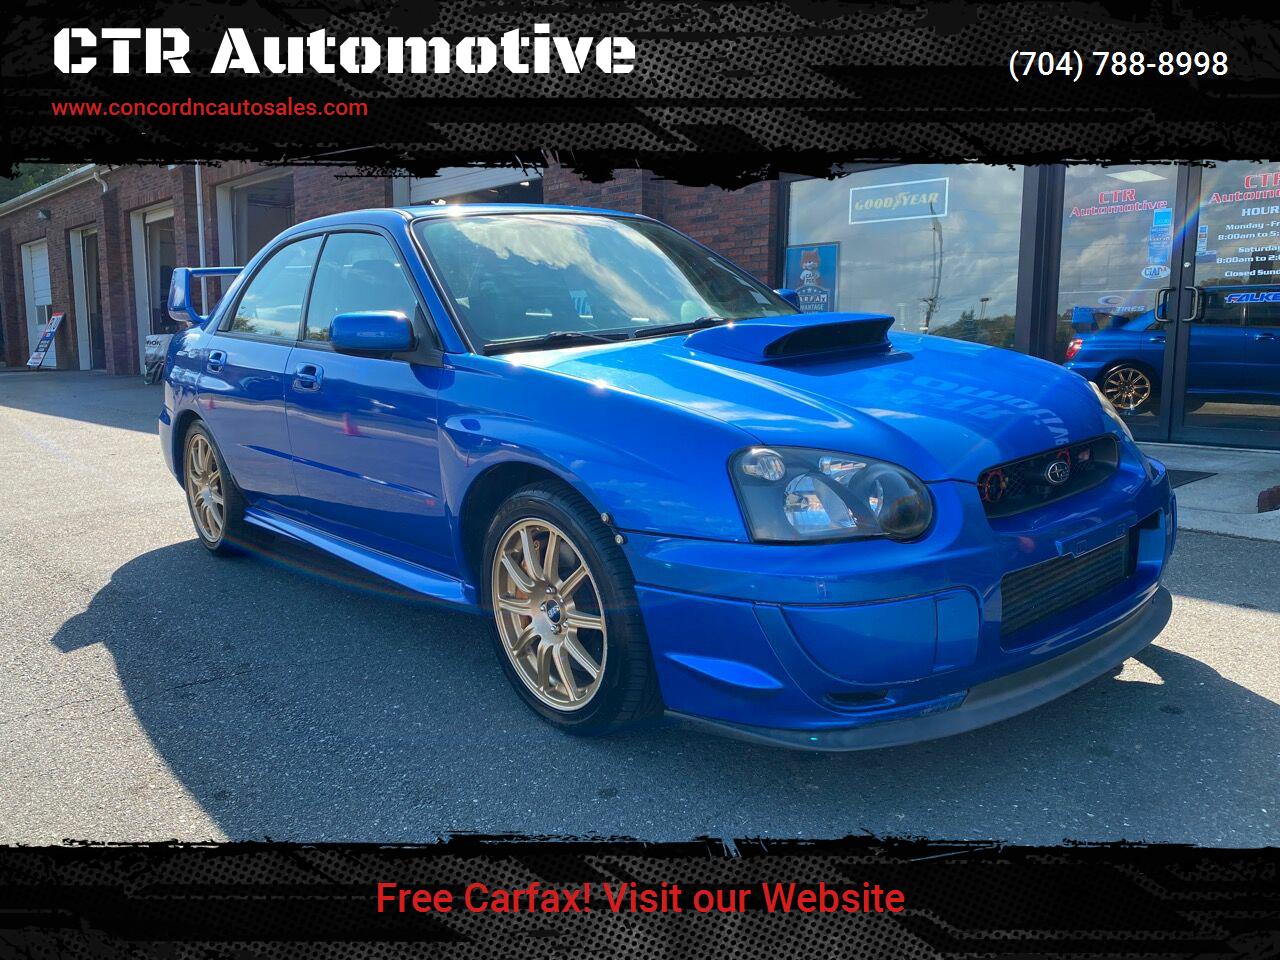 used 2004 subaru impreza for sale carsforsale com used 2004 subaru impreza for sale